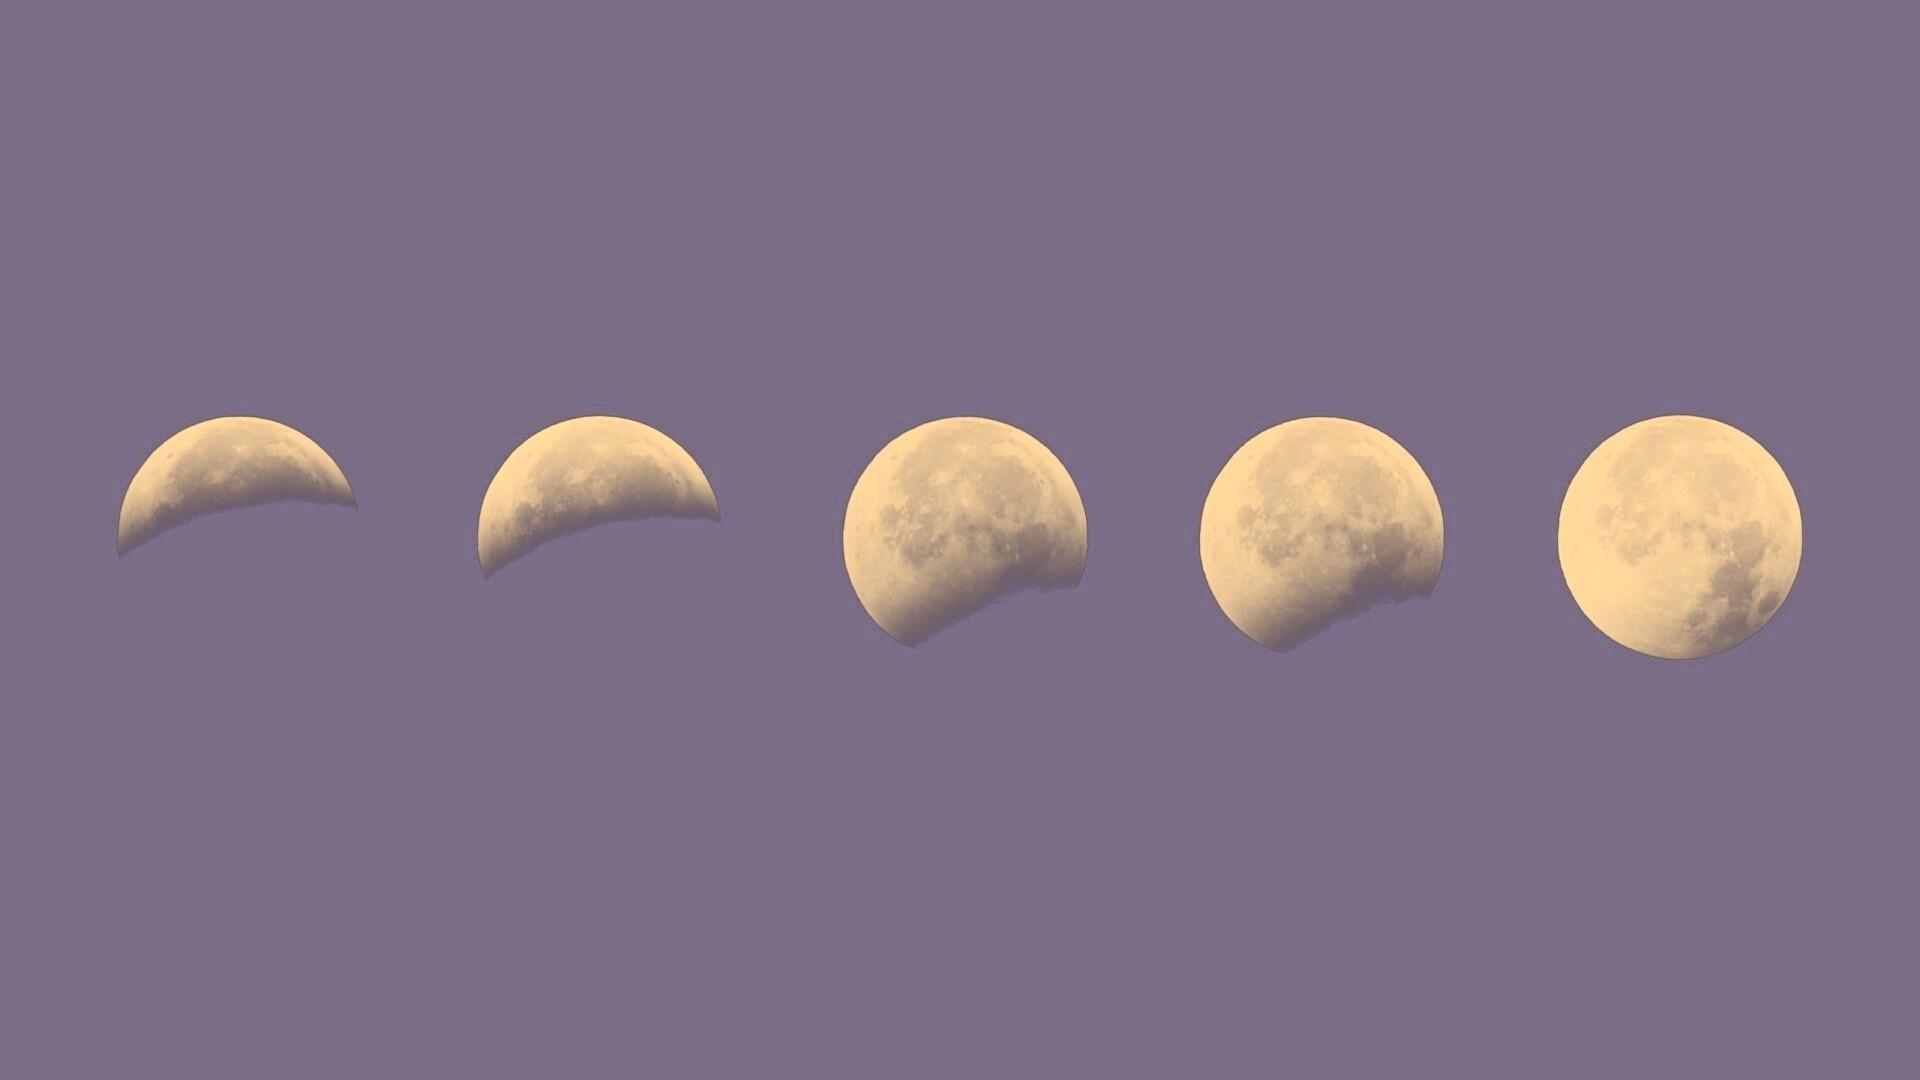 Moon Phases Full HD Wallpaper